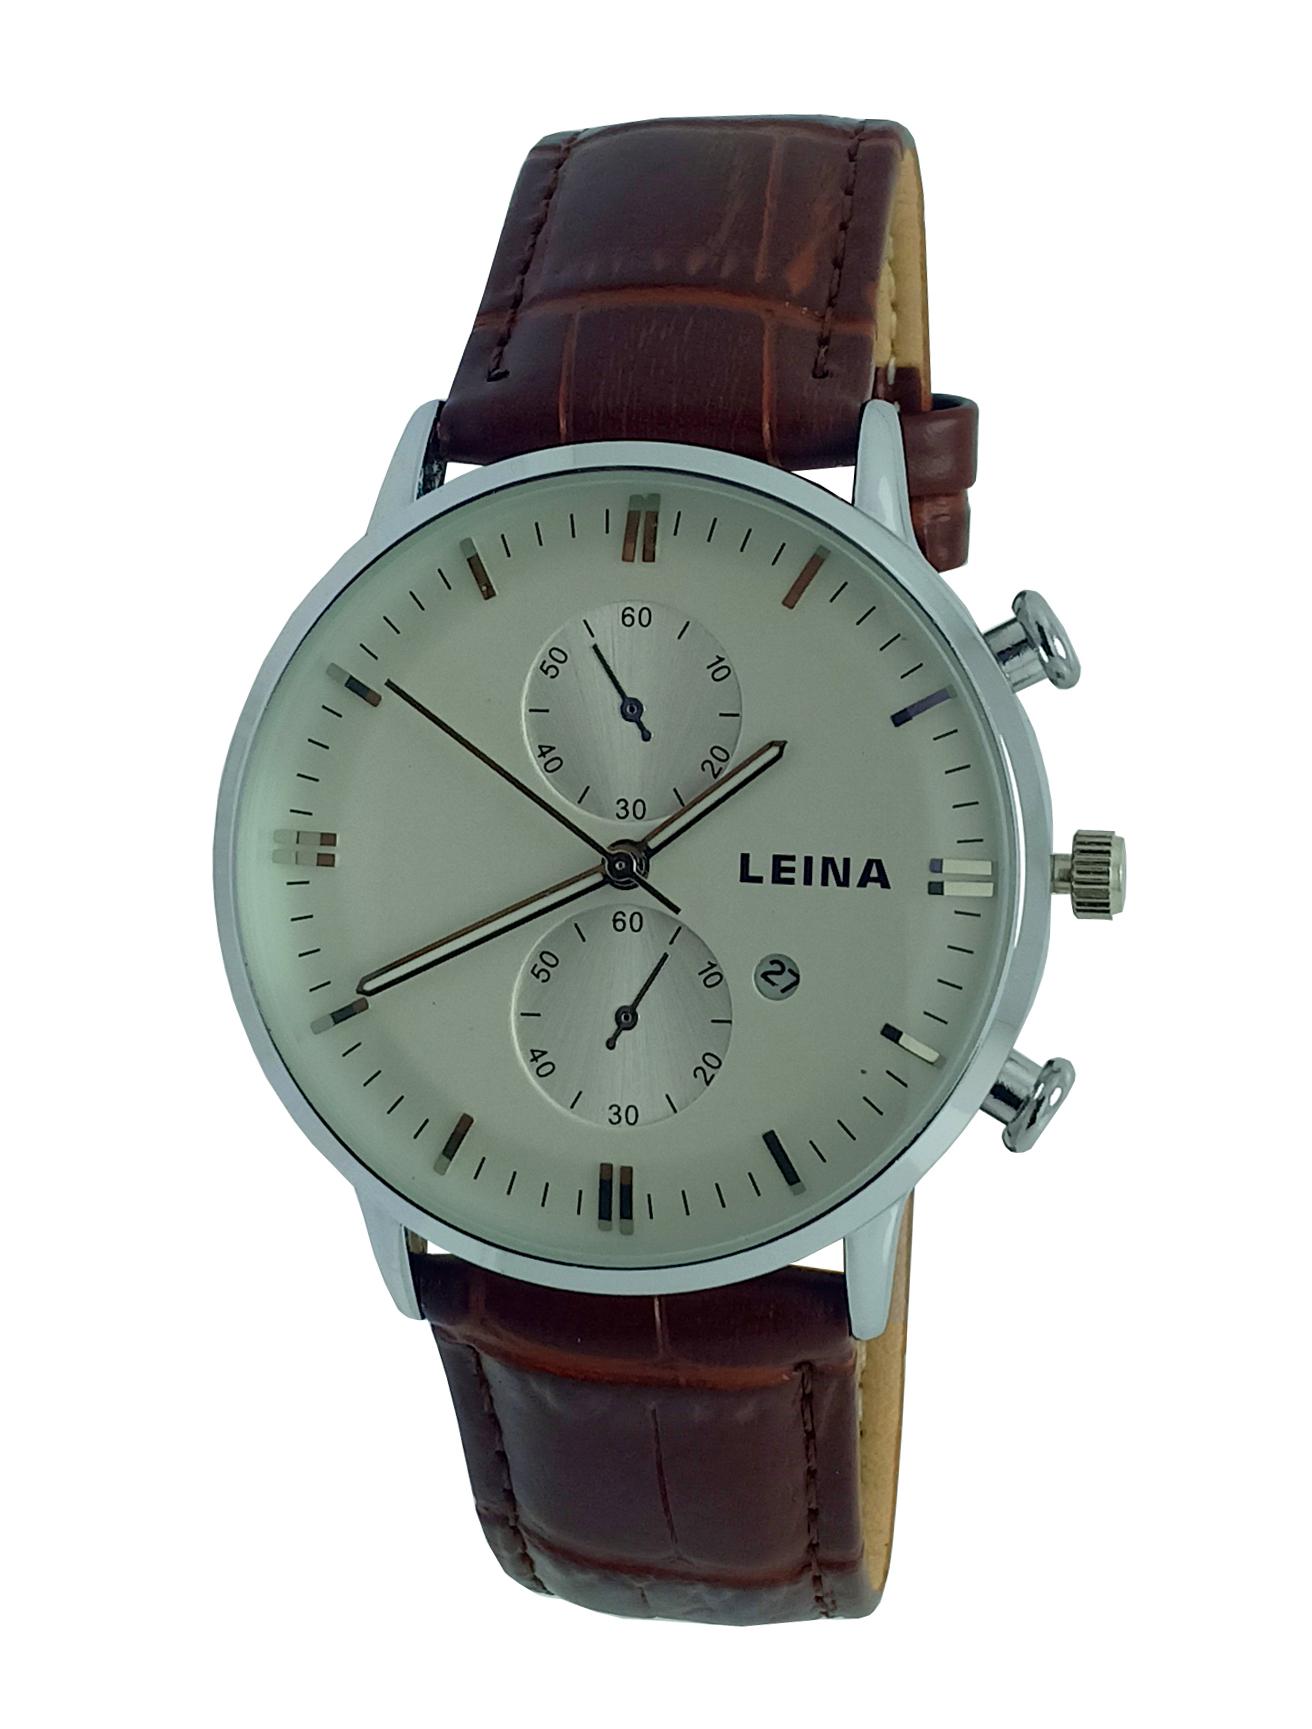 JM New Laina Fency Watch Vol 3